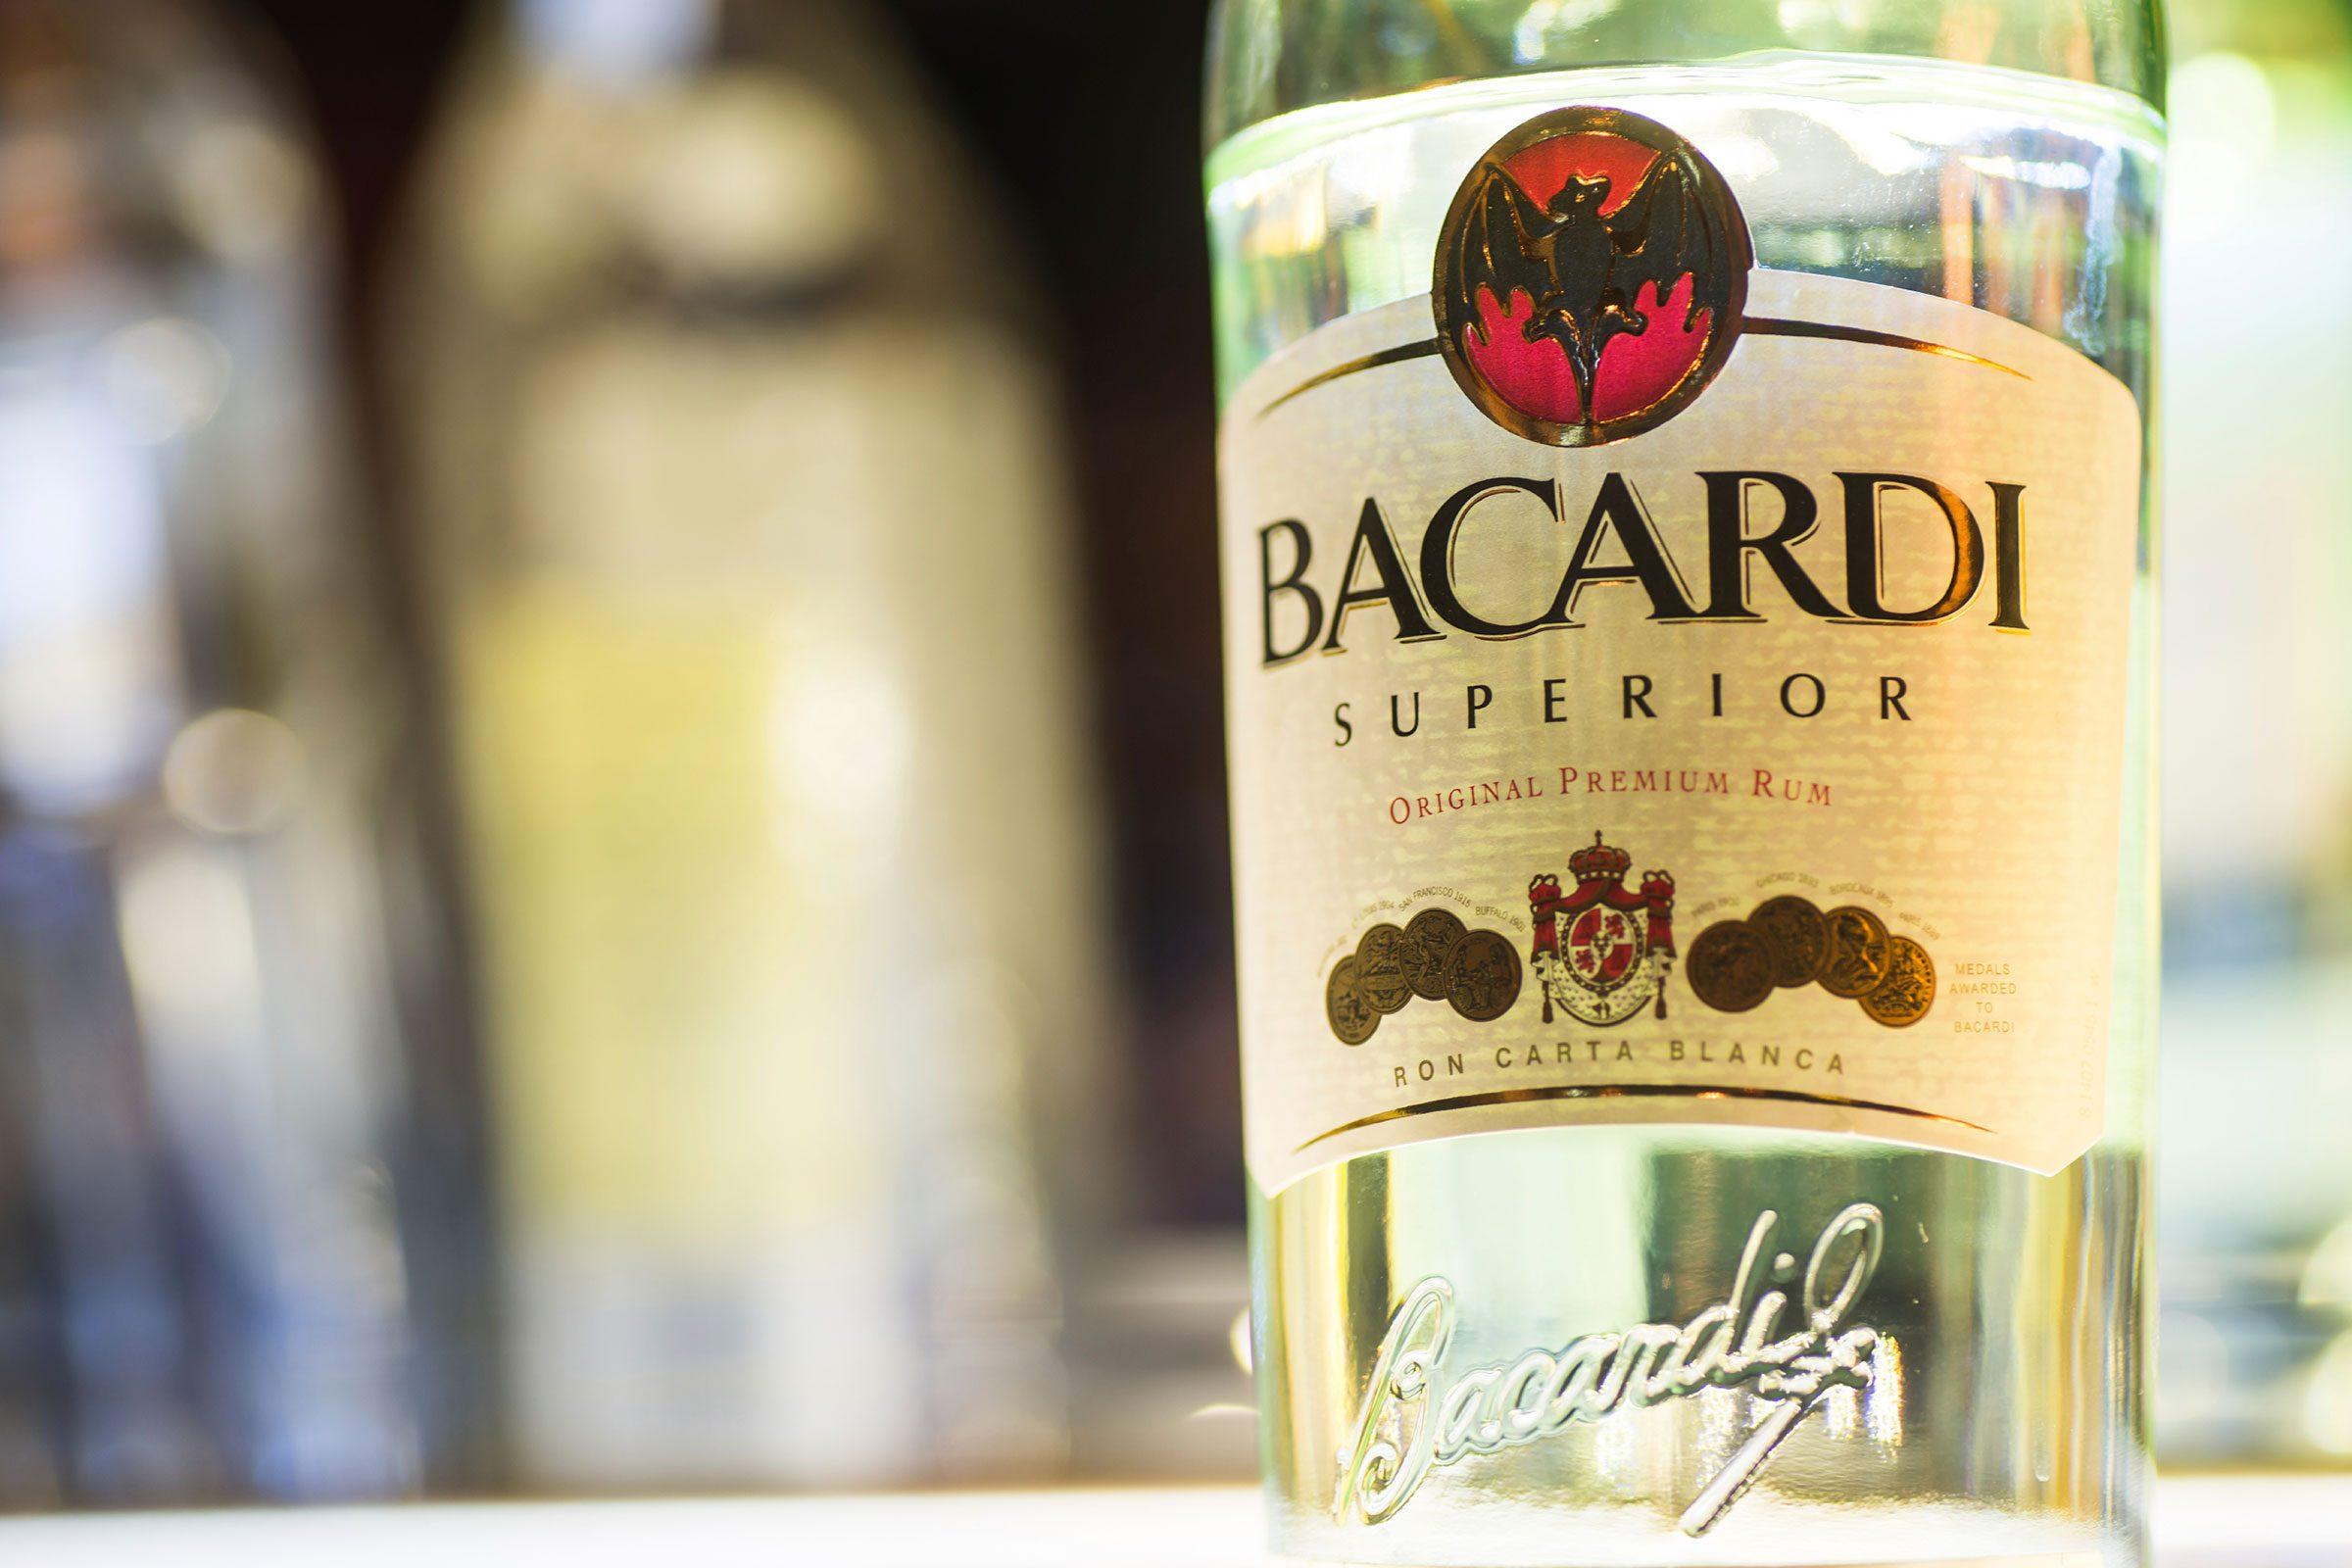 Nerve Pain Relief: The Rum Rumba